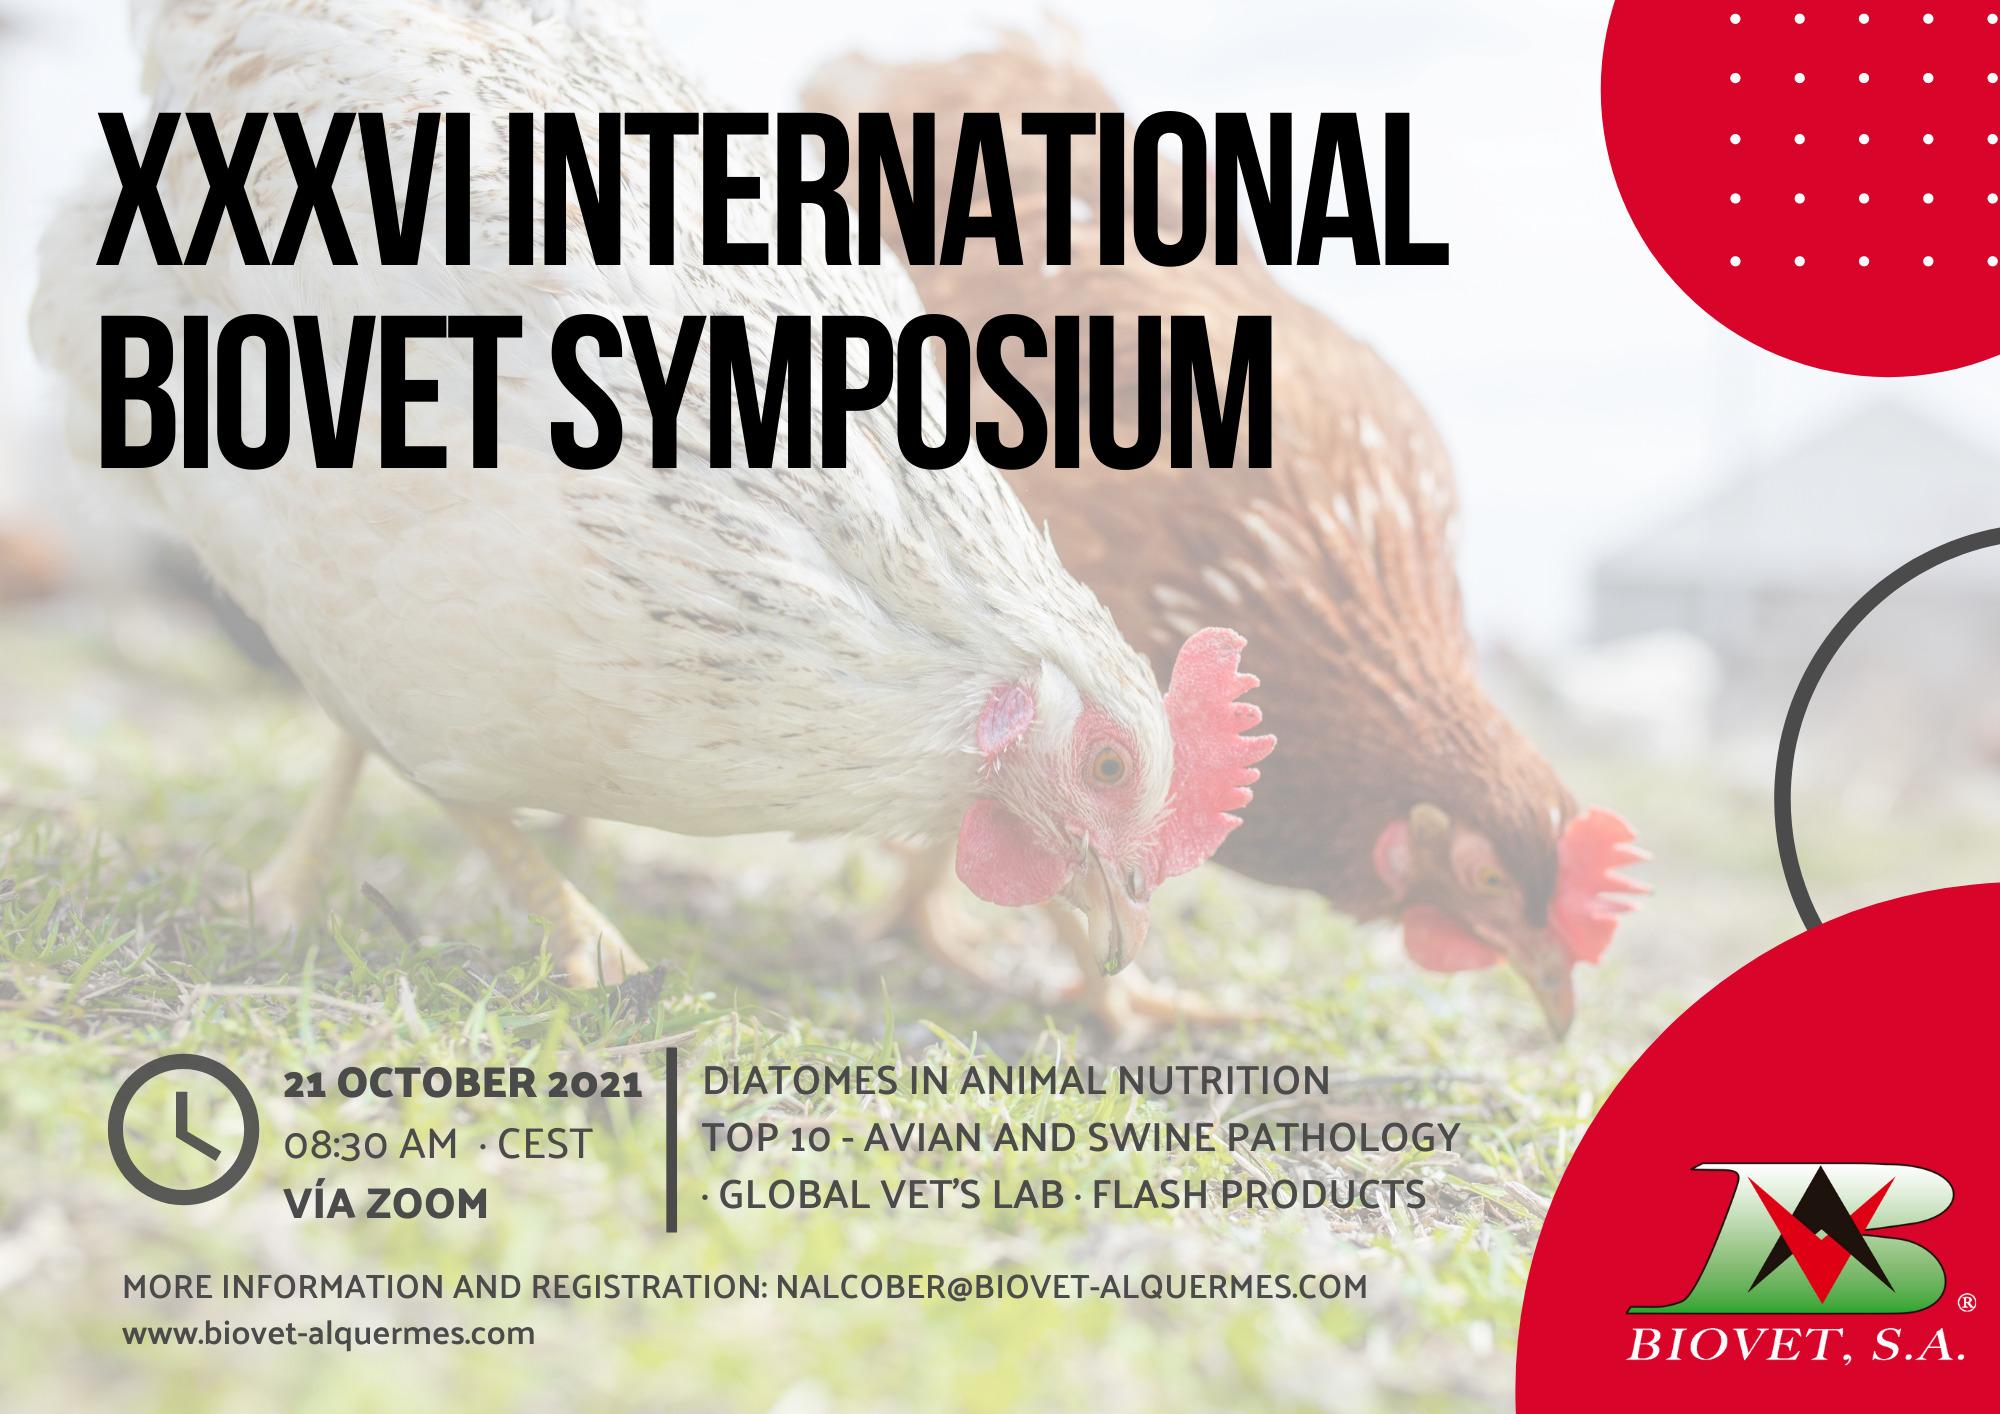 International Biovet Symposium